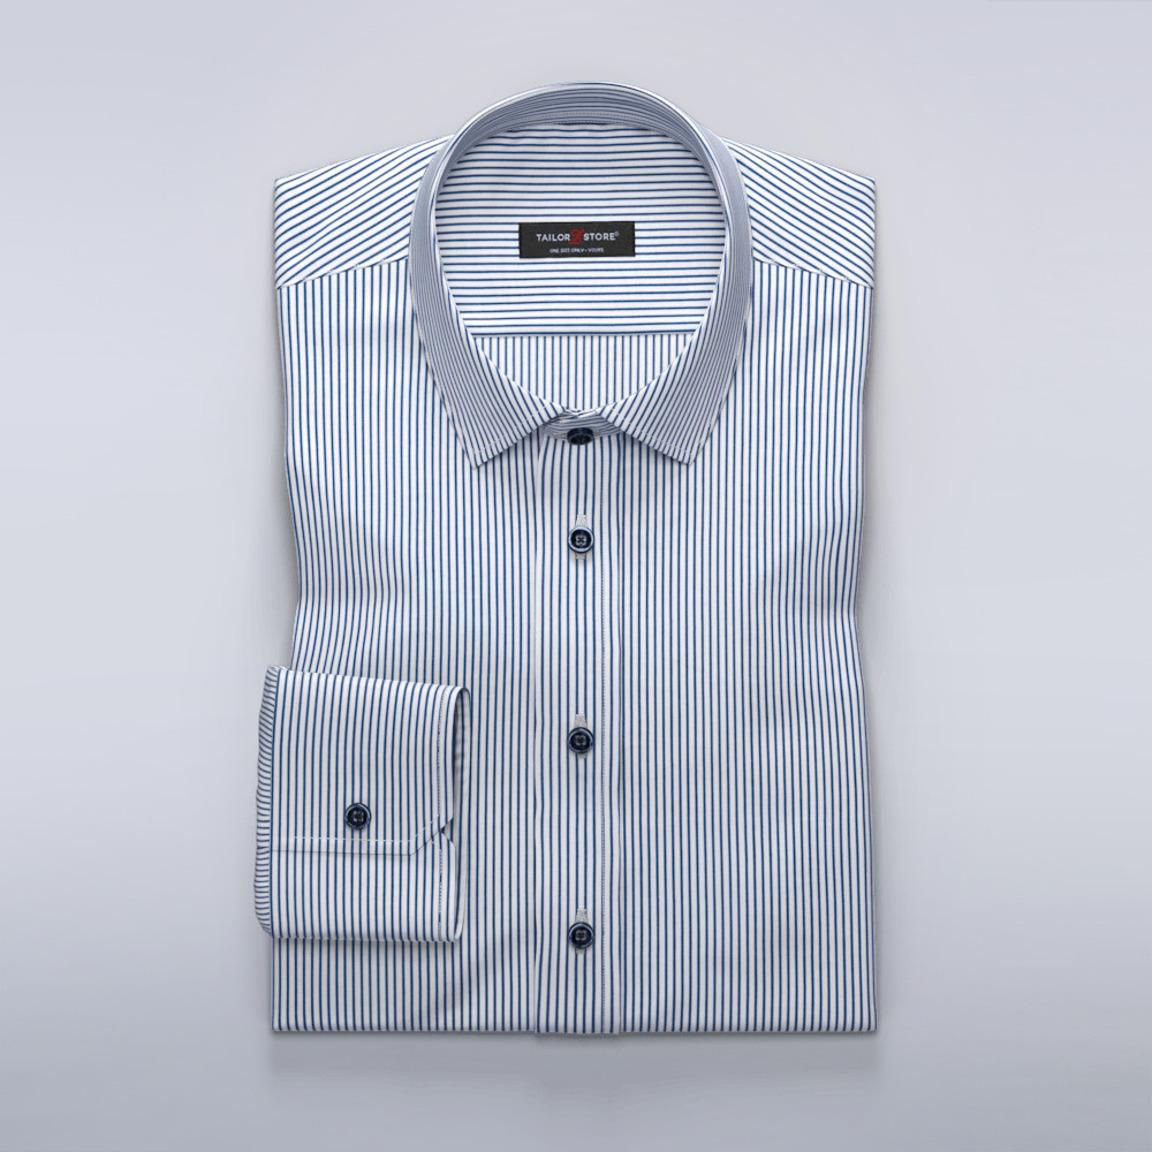 Navy striped business shirt with split yoke